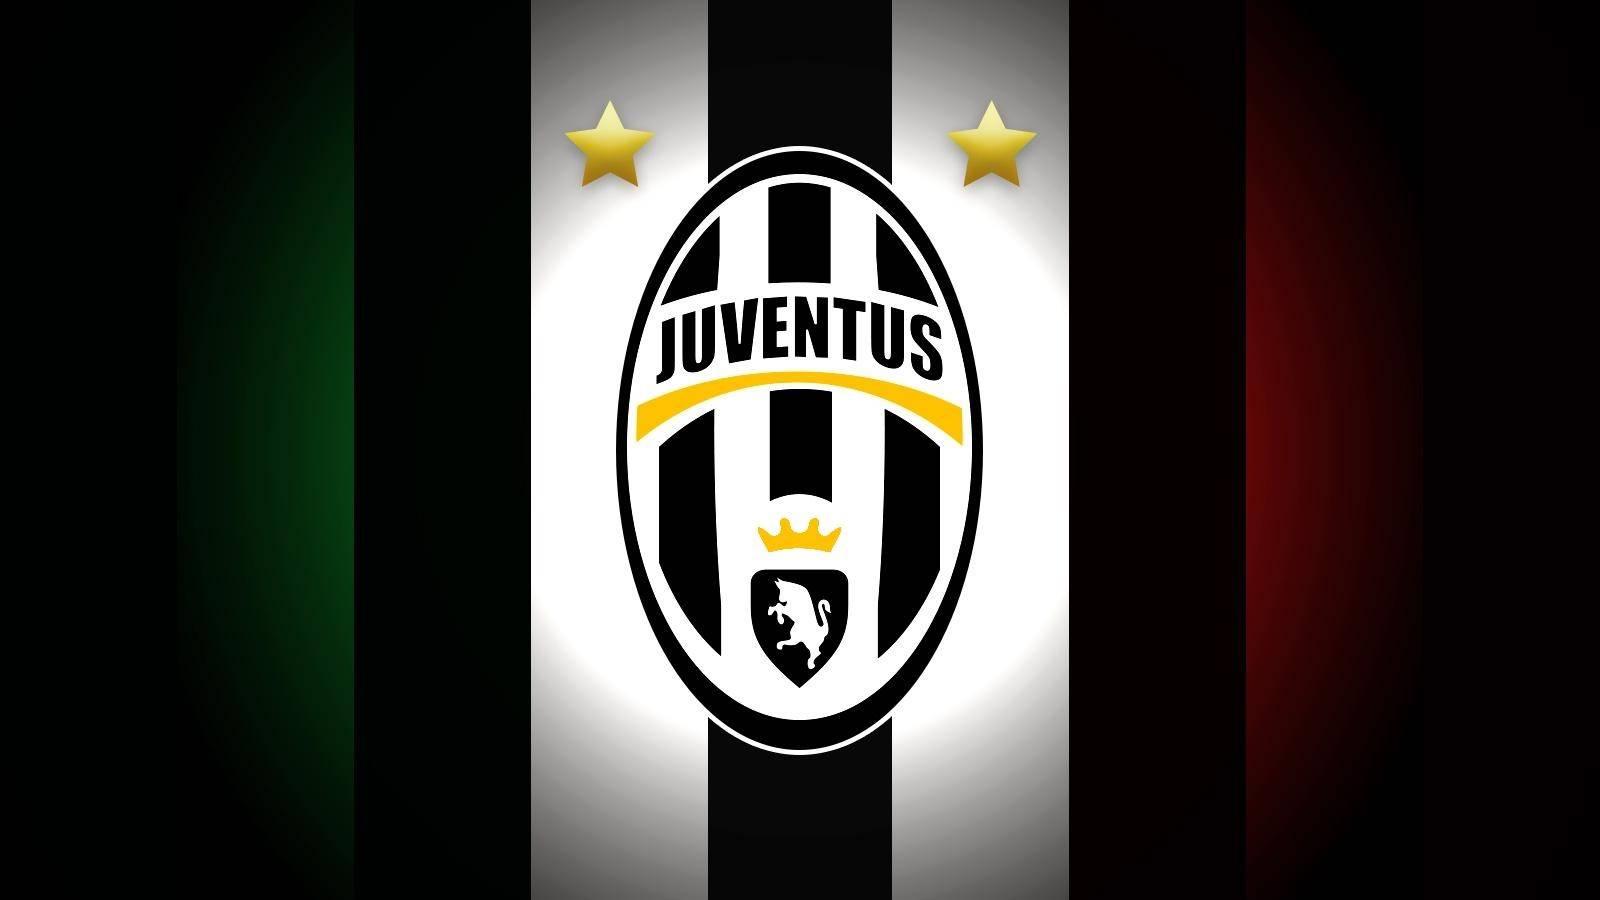 Wallpaper, Juventus Wallpaper Hd Free Android Application ...